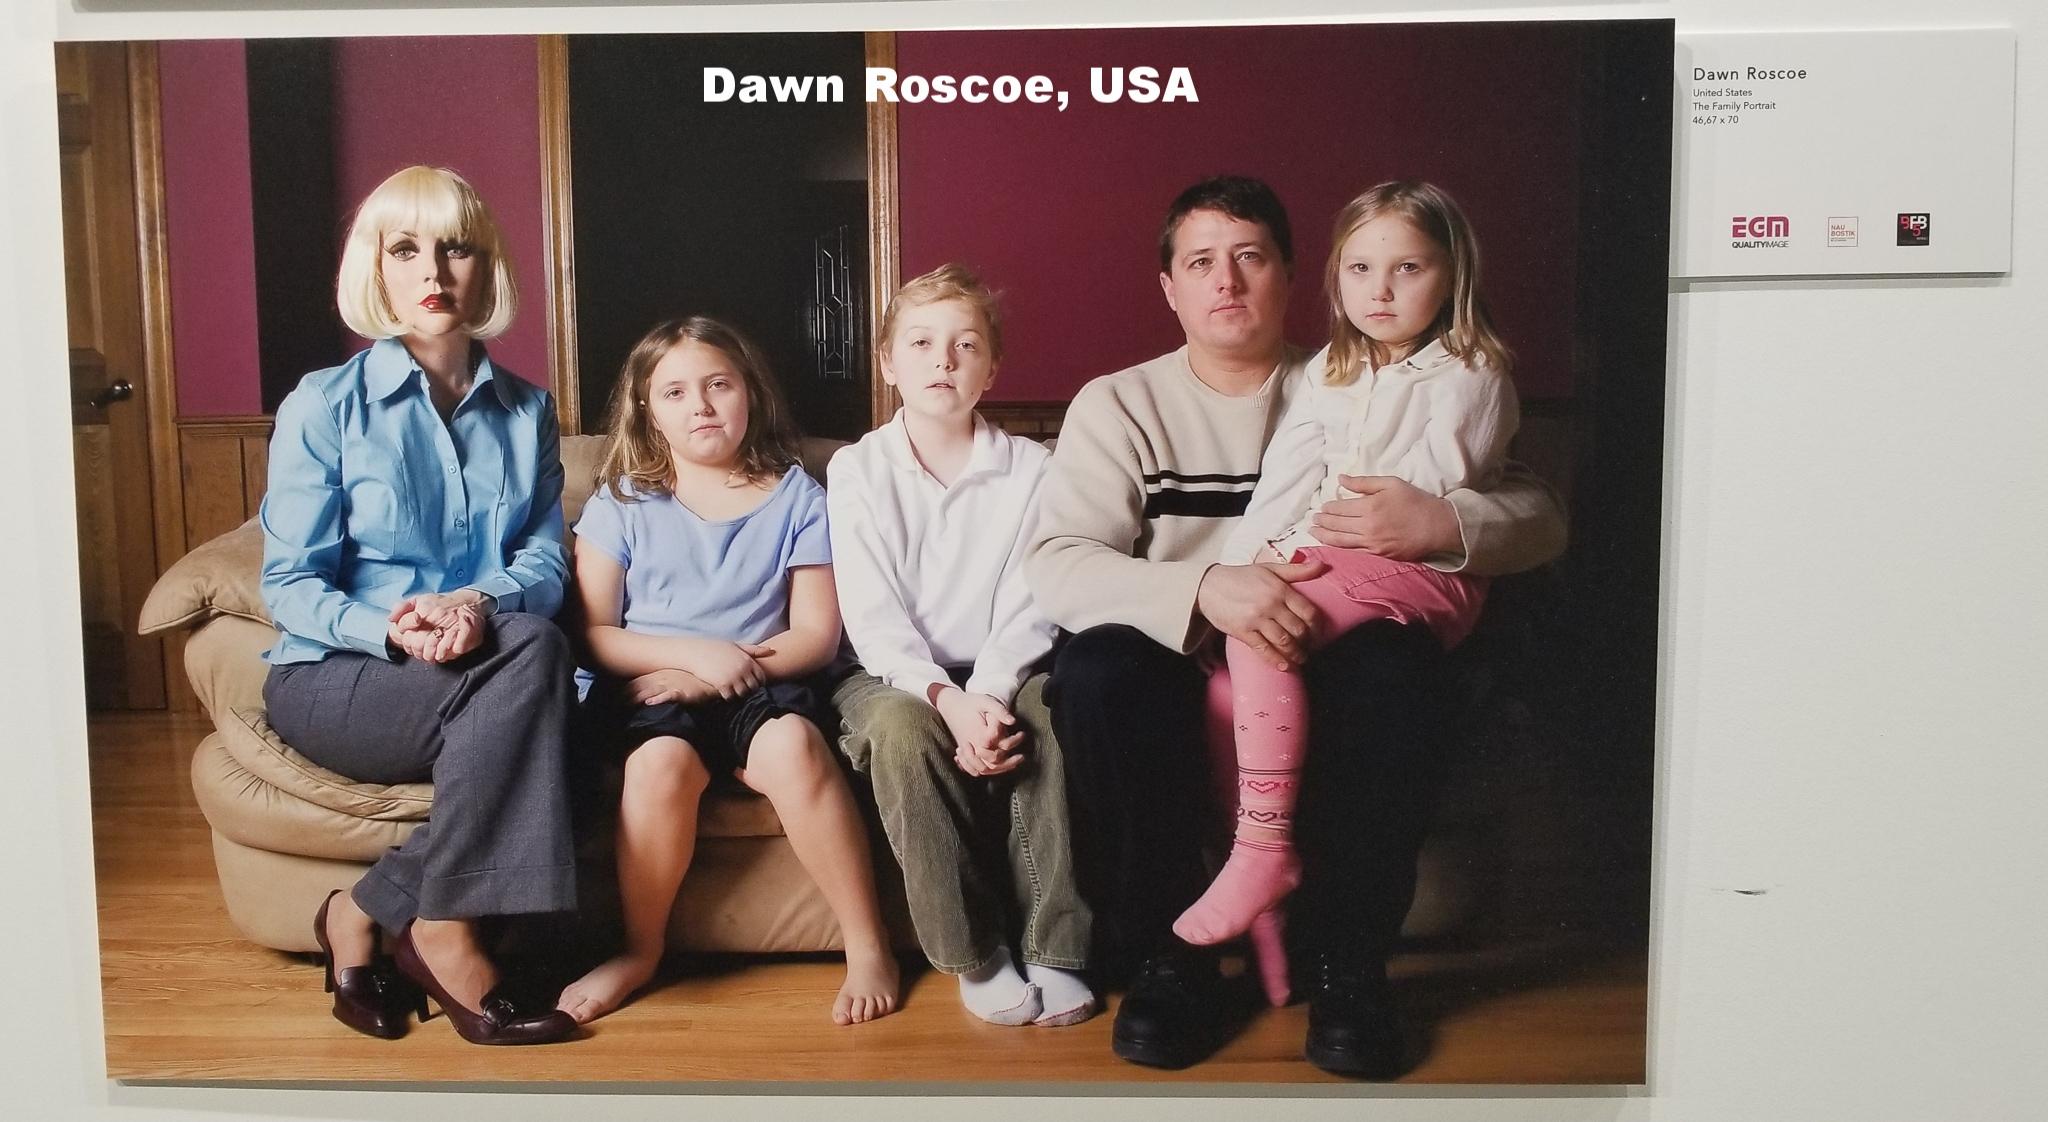 Dawn Roscoe, United States